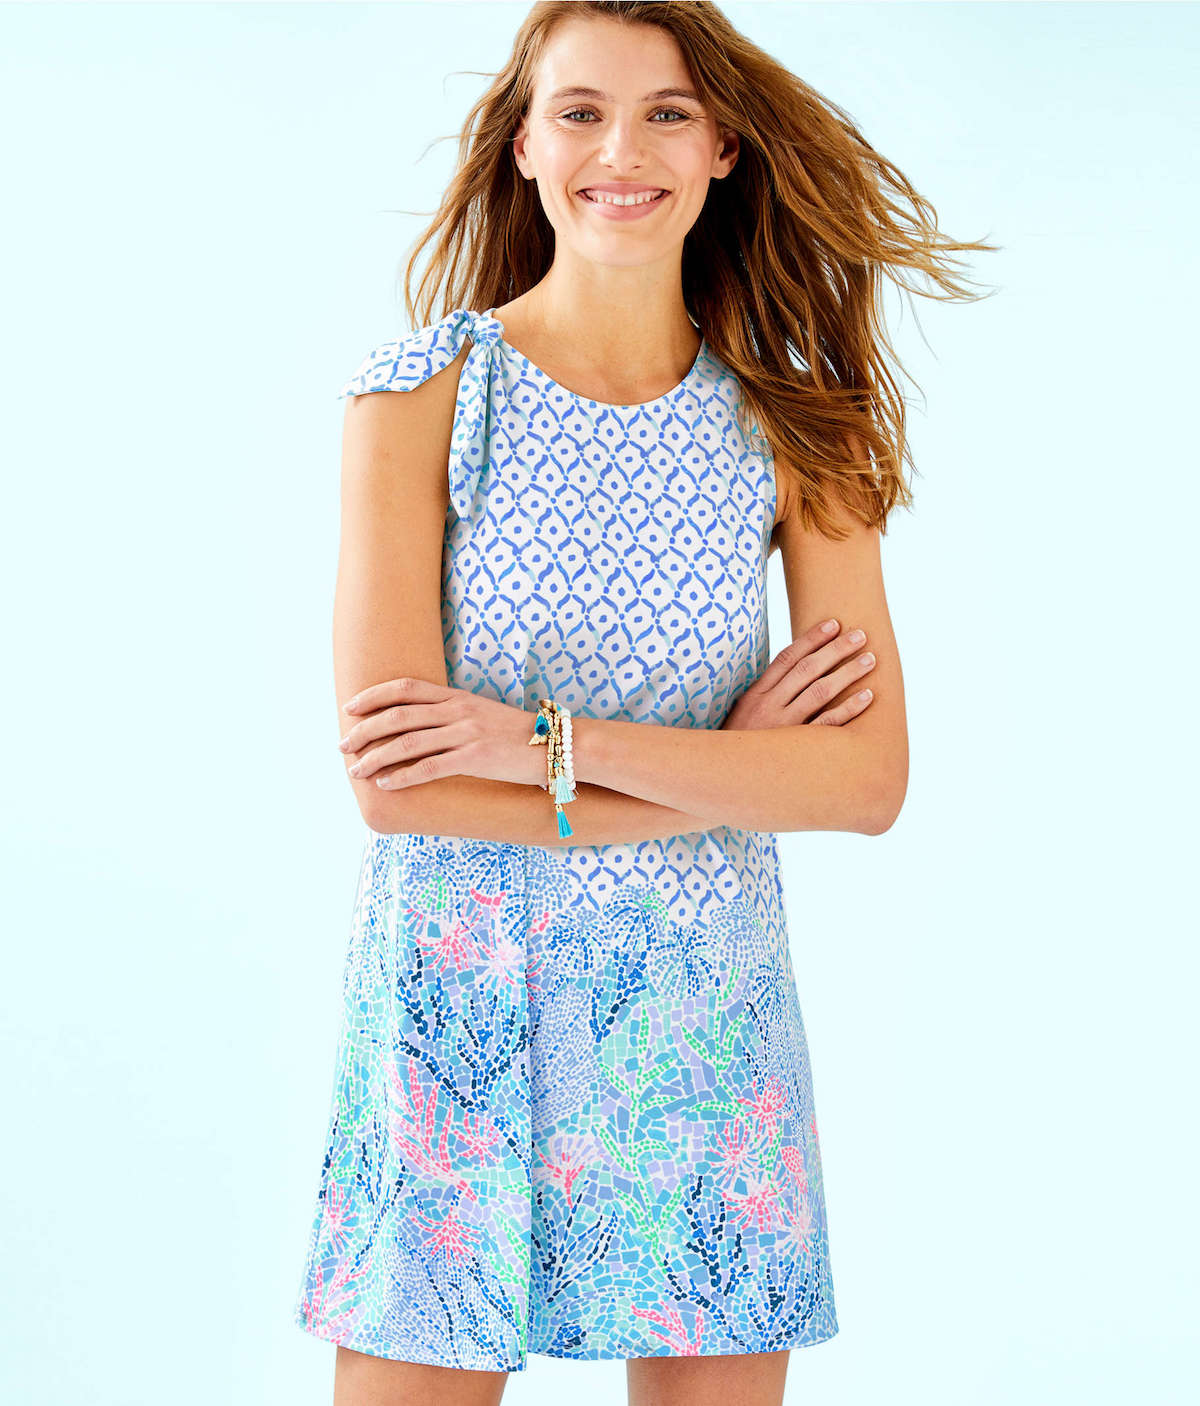 Lilly Pulitzer Luella Swing Dress